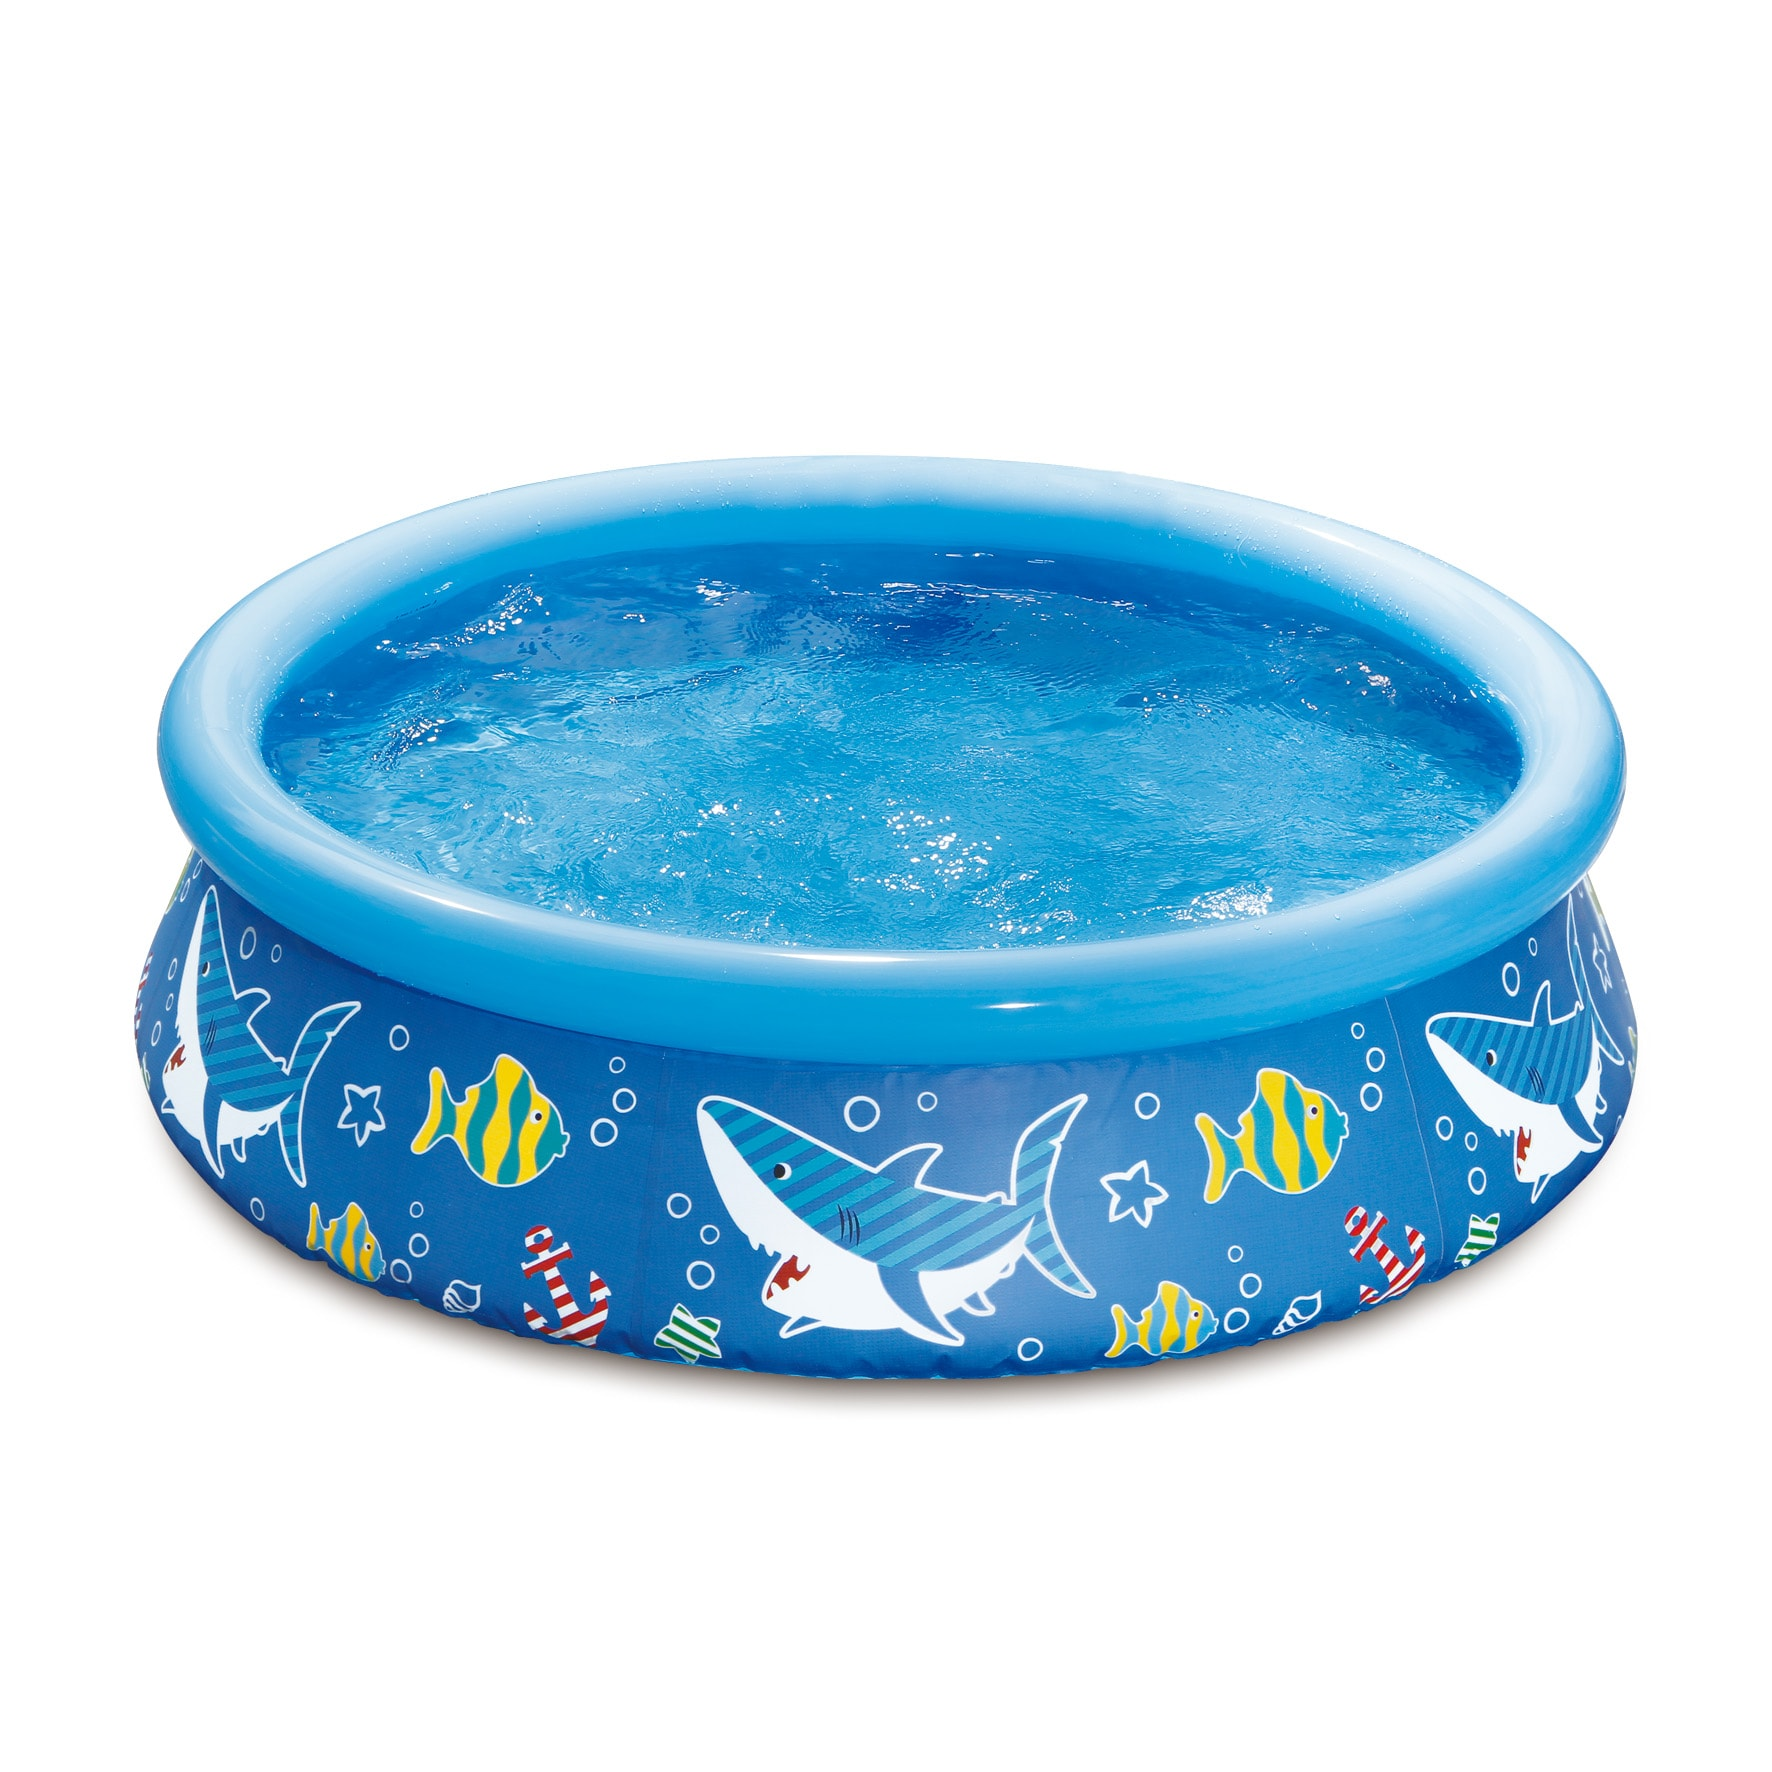 Blue PVC 5-feet Diameter x 15-inches High Quick Set Ring Pool